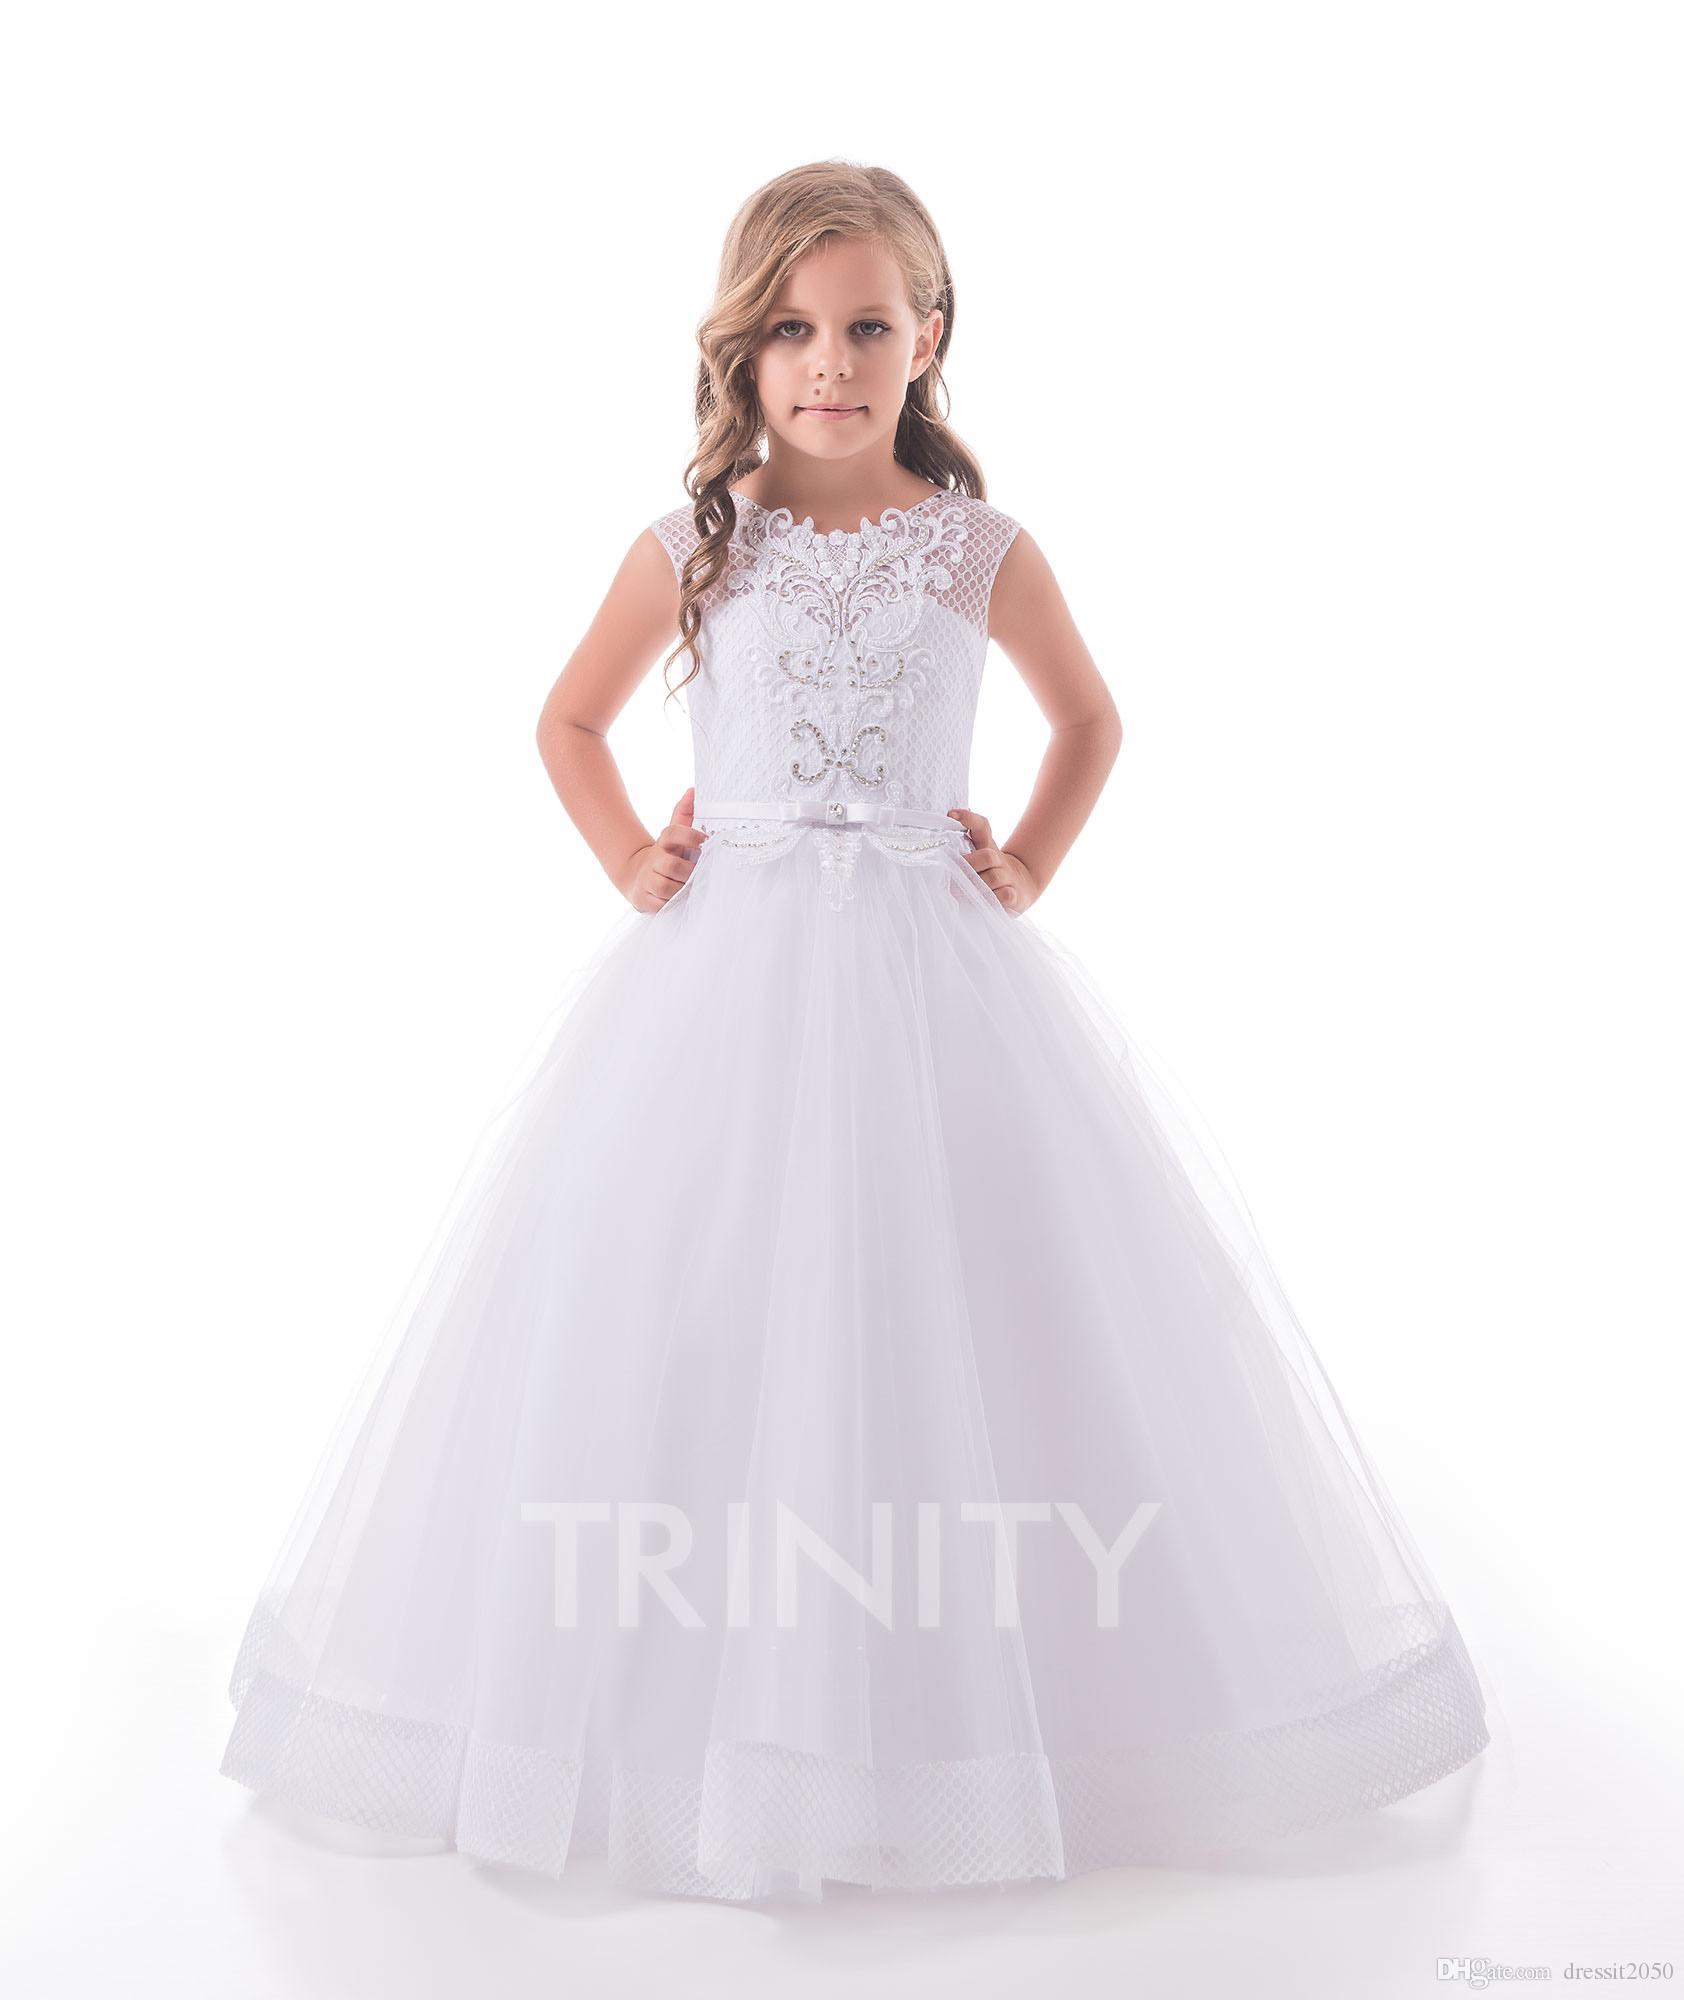 b0ffb9e23494e Pretty White Lace/Tulle Jewel Applique Flower Girl Dresses Girls' Pageant  Dresses Holidays/Birthday Dress/Skirt Custom Size 2-14 DF720475